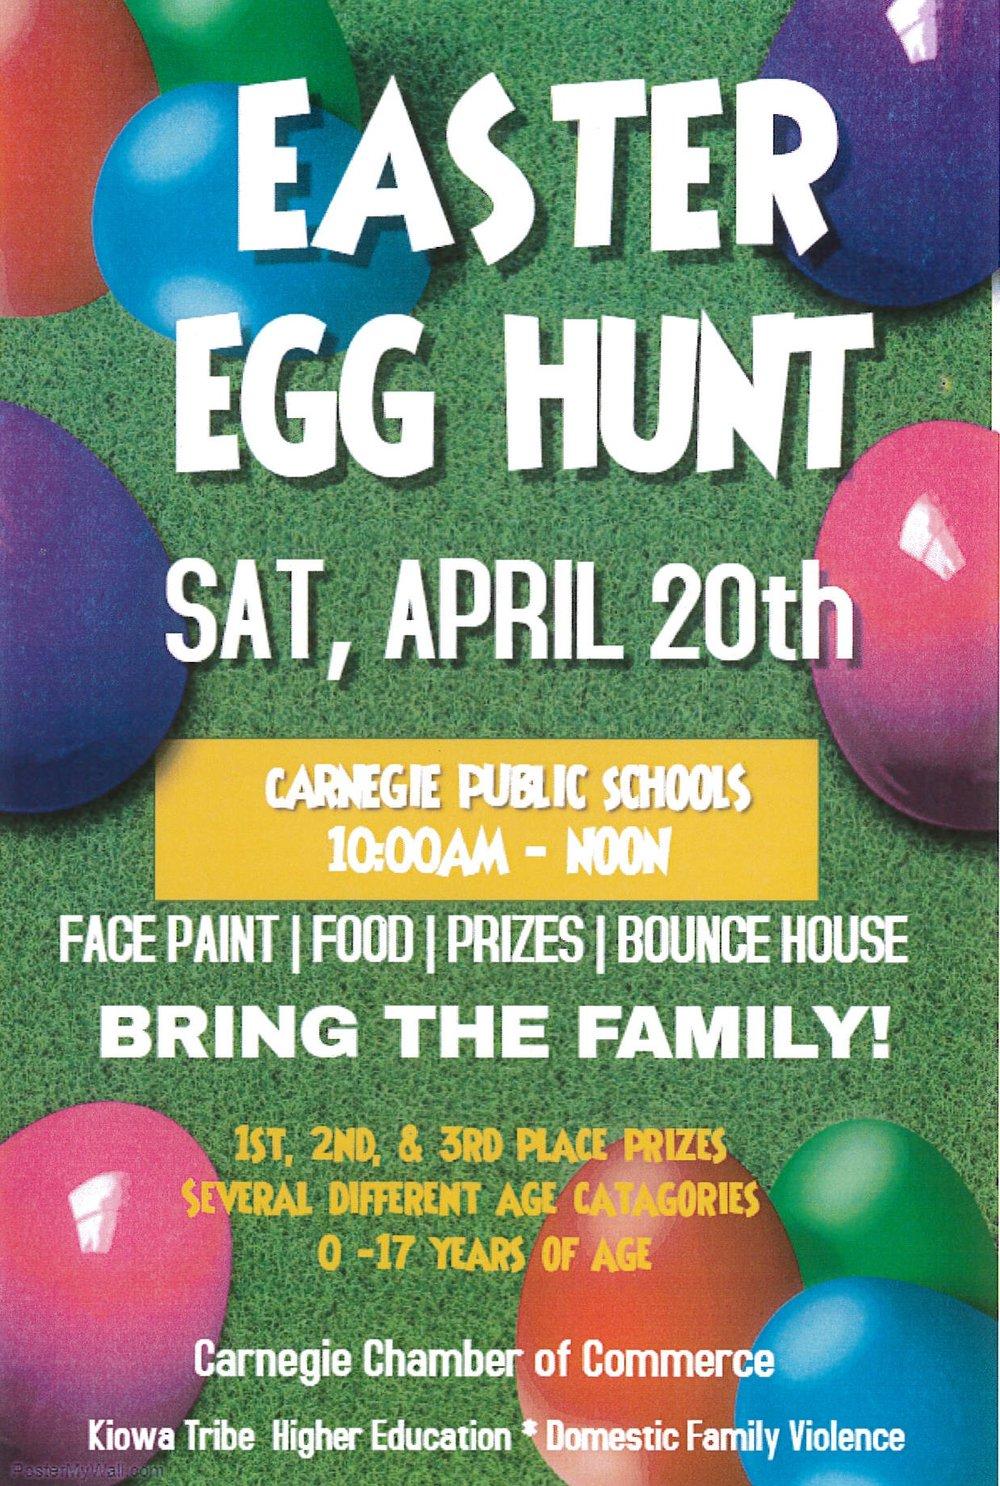 Easter+Egg+Hunt+Flyer+-+Kiowa+DV_Page_1.jpg